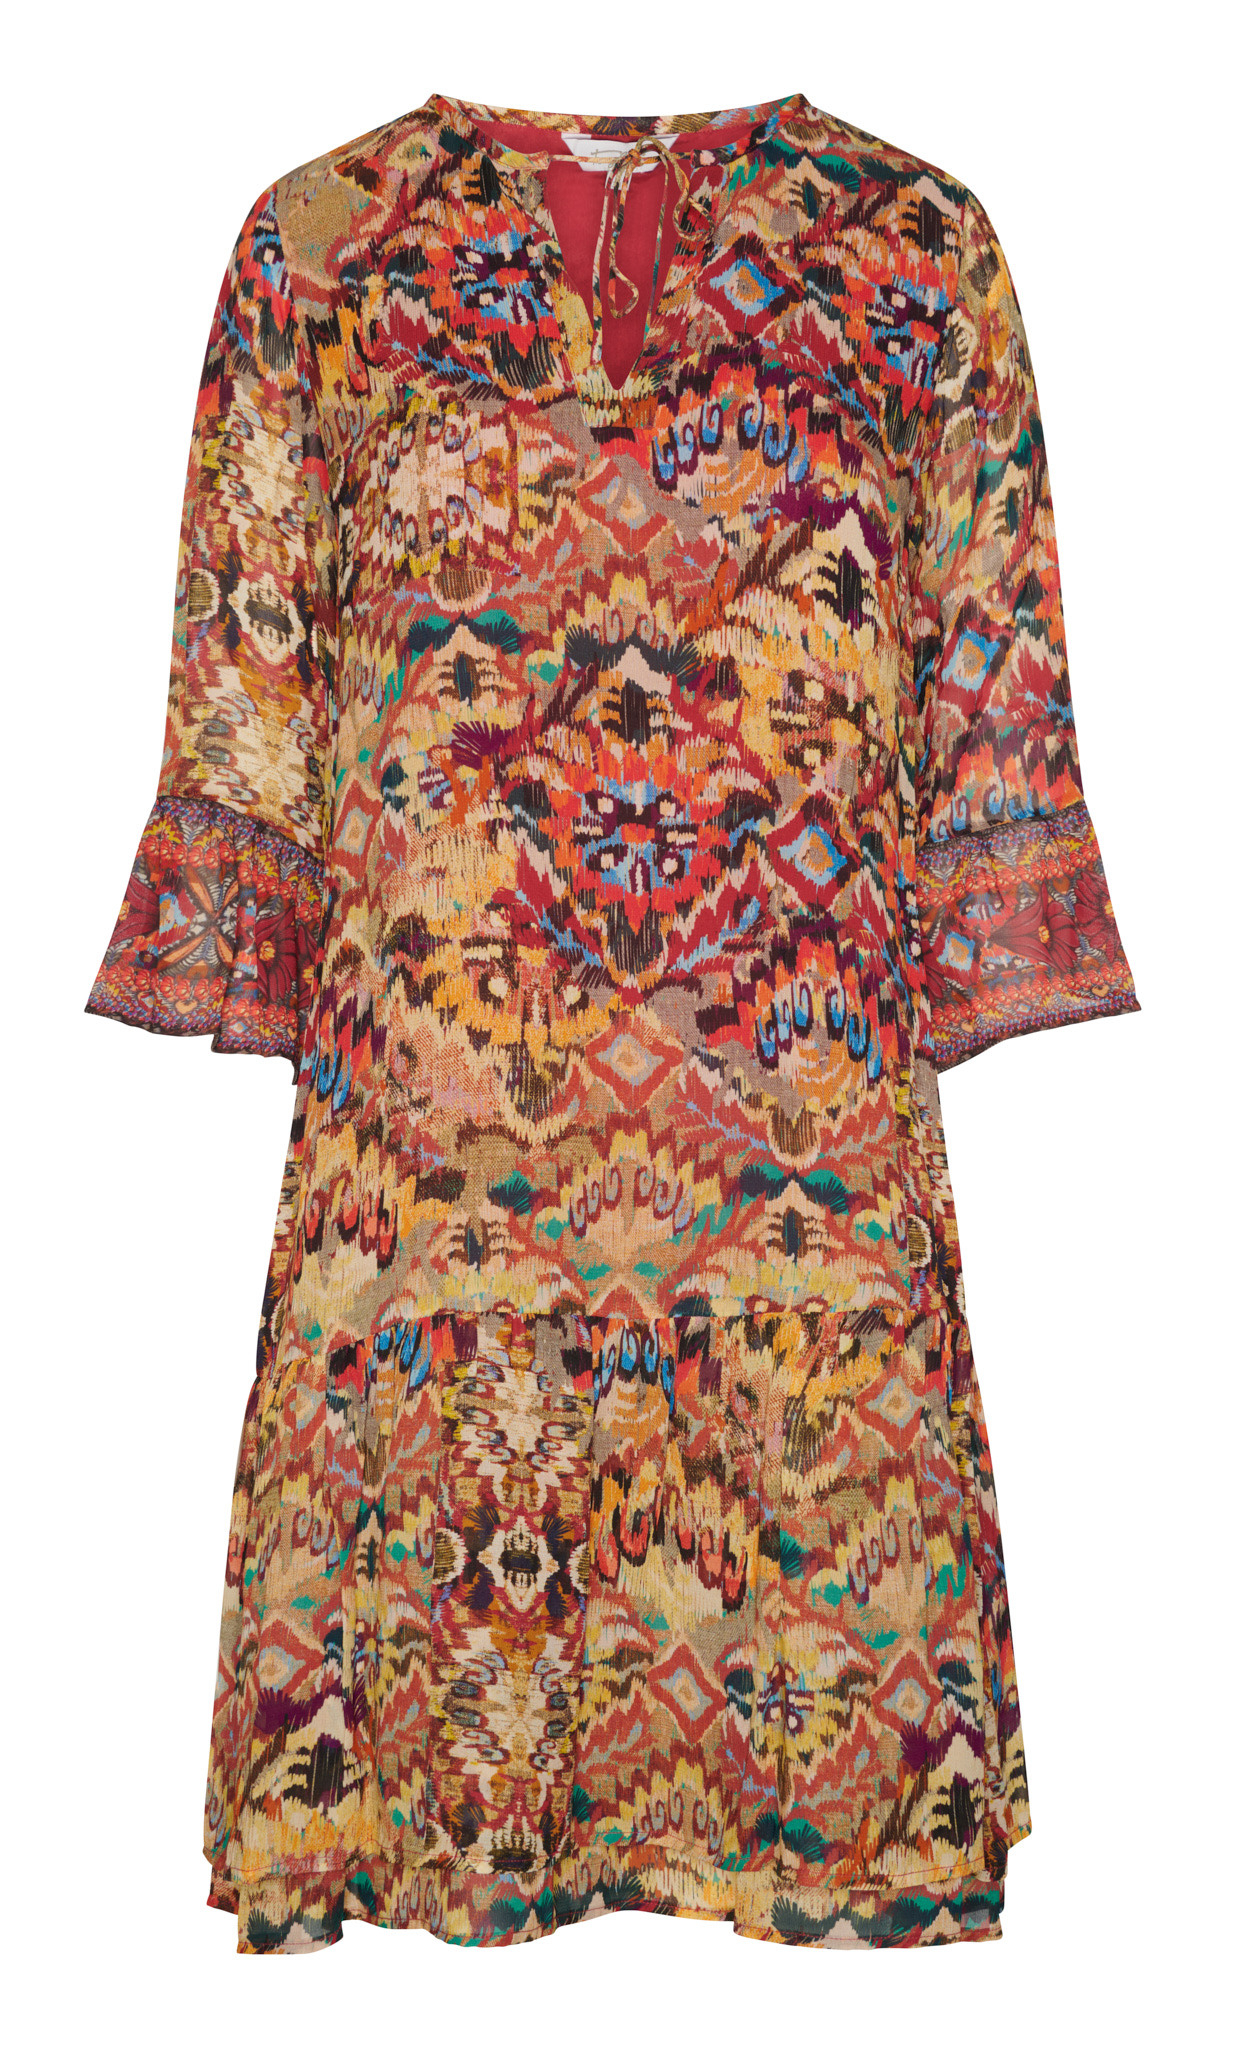 Frogbox Kleid  Woman  Sale  Sør Onlineshop